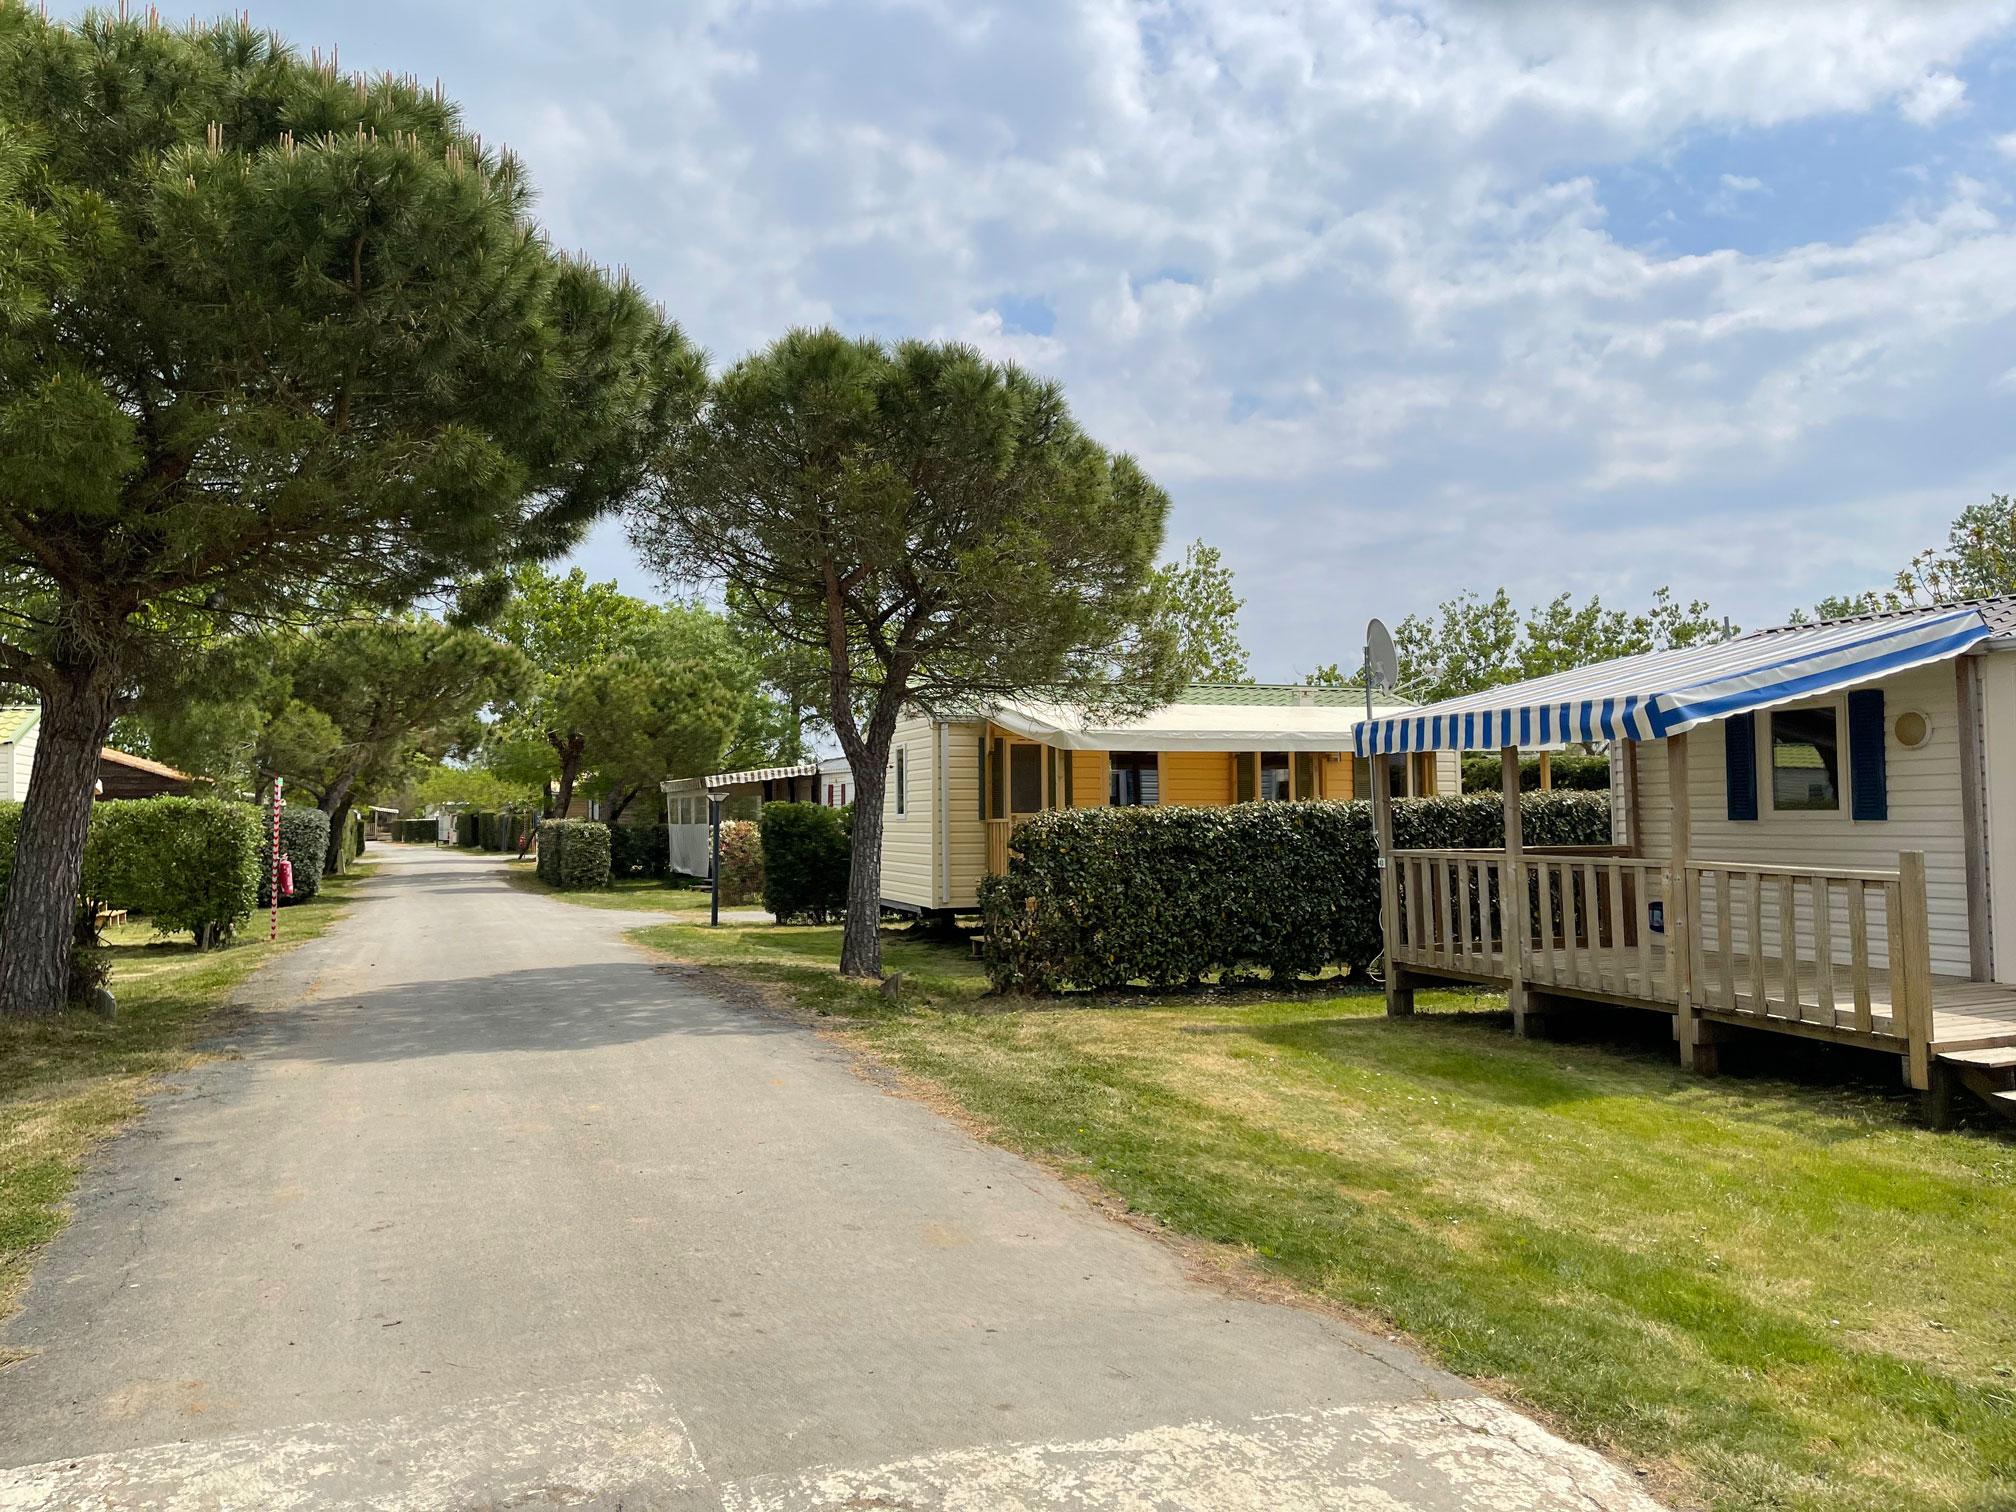 location-mobil-home-6-8-personnes-eco-camping-le-port-de-moricq